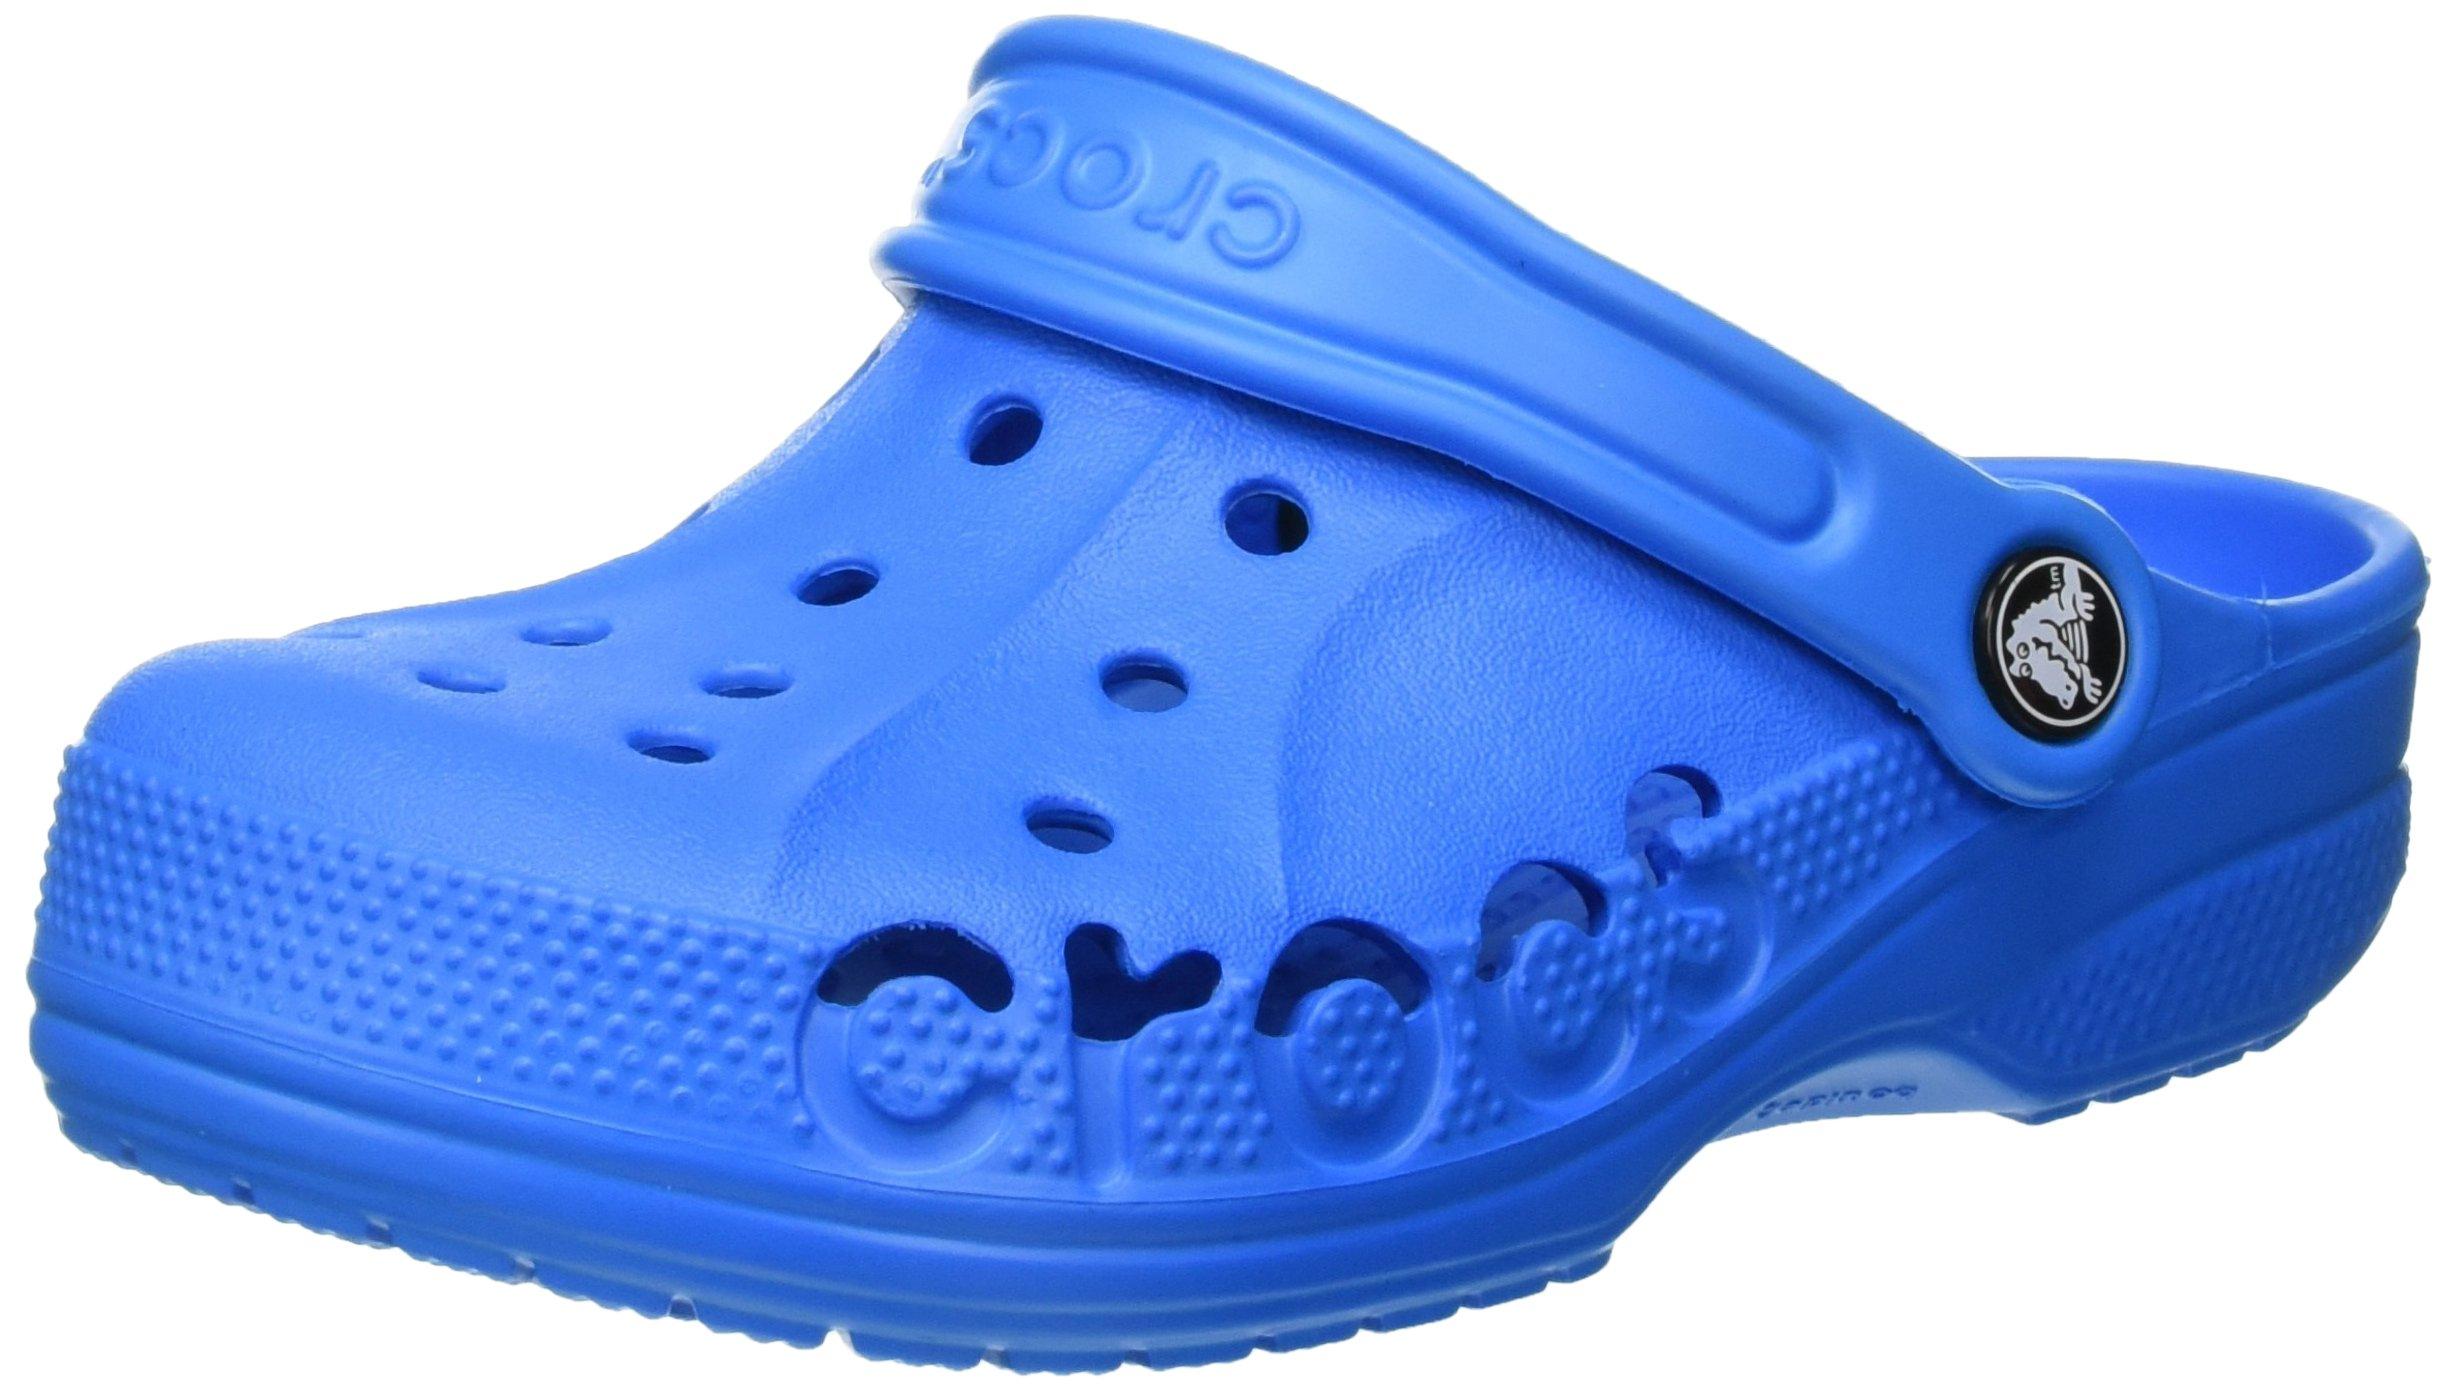 Crocs Kids' Baya 10190 Clog, Ocean, 8-9 M US Toddler